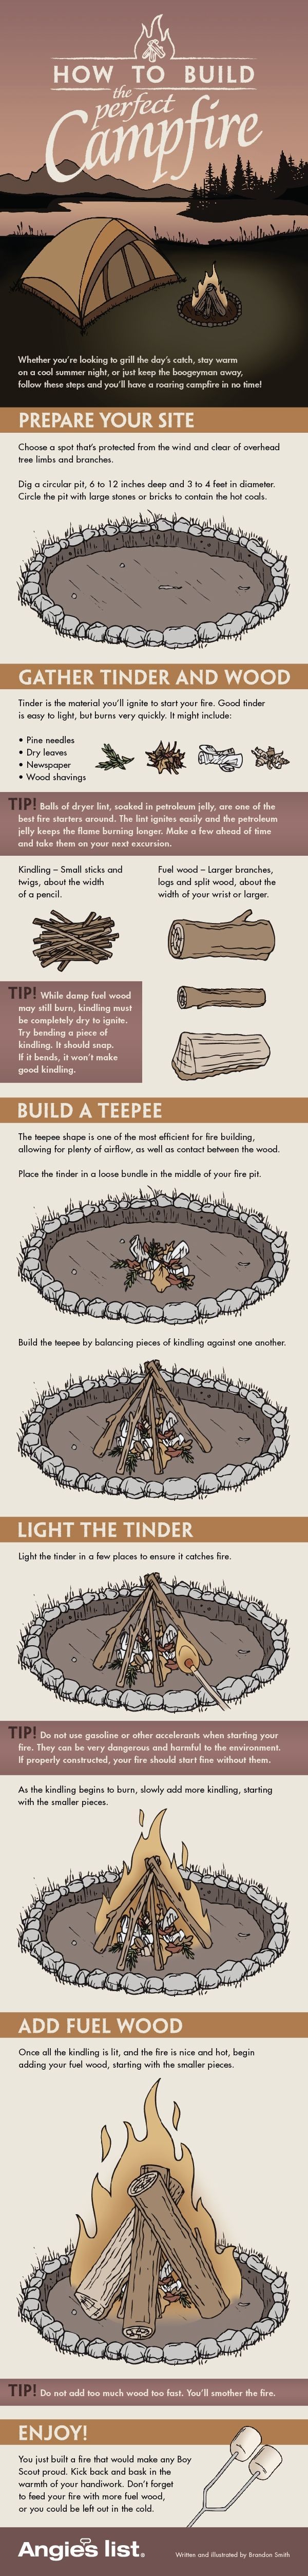 how to build campfire rimworld